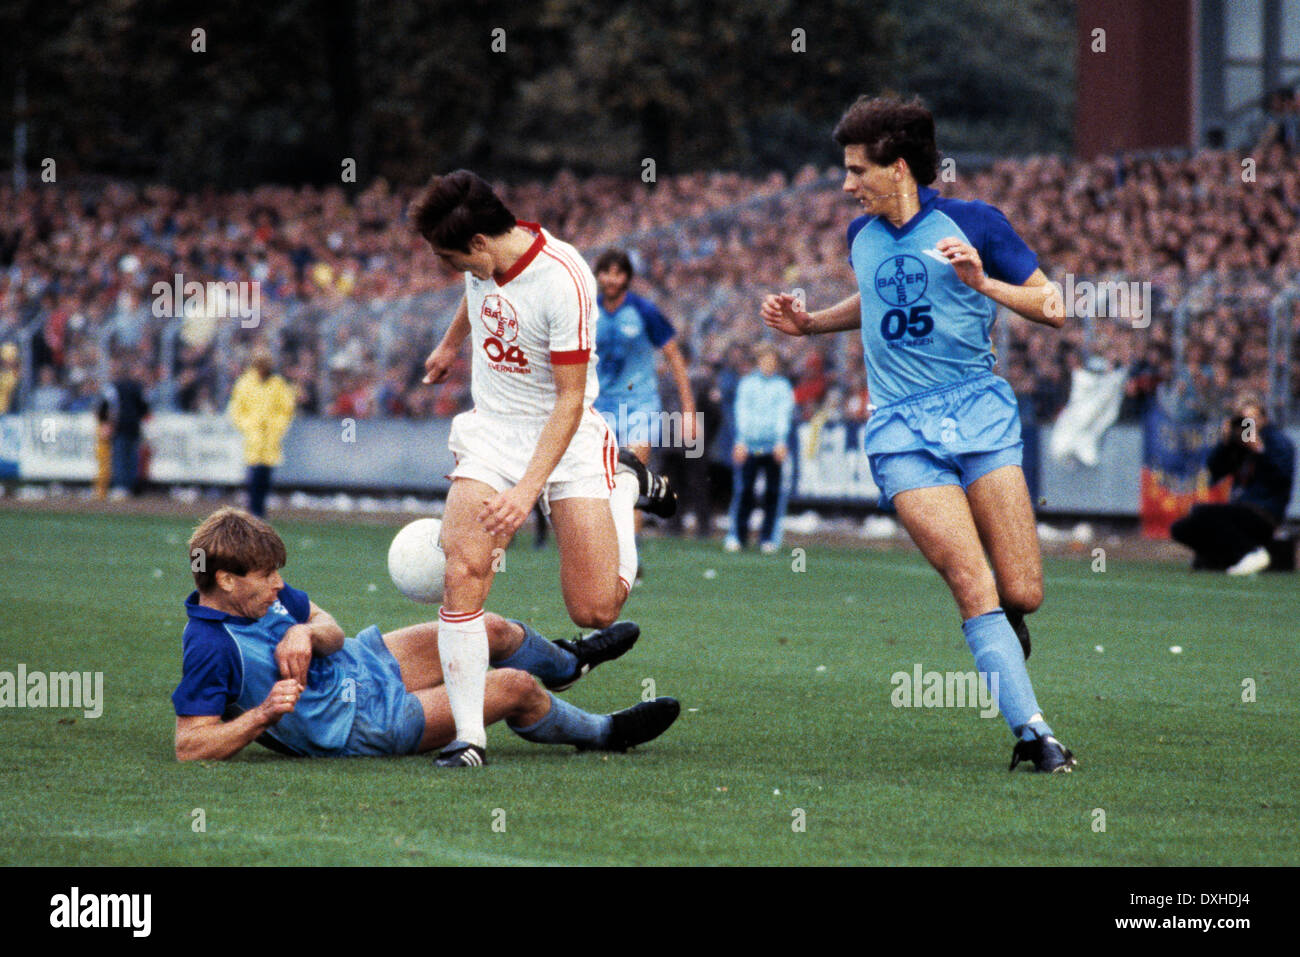 football, Bundesliga, 1983/1984, Grotenburg Stadium, FC Bayer 05 Uerdingen versus Bayer 04 Leverkusen 2:1, scene of the match, f.l.t.r. Norbert Brinkmann (Uerdingen), Rudolf Wojtowicz (Leverkusen), Sascha Jusufi (Uerdingen) - Stock Image